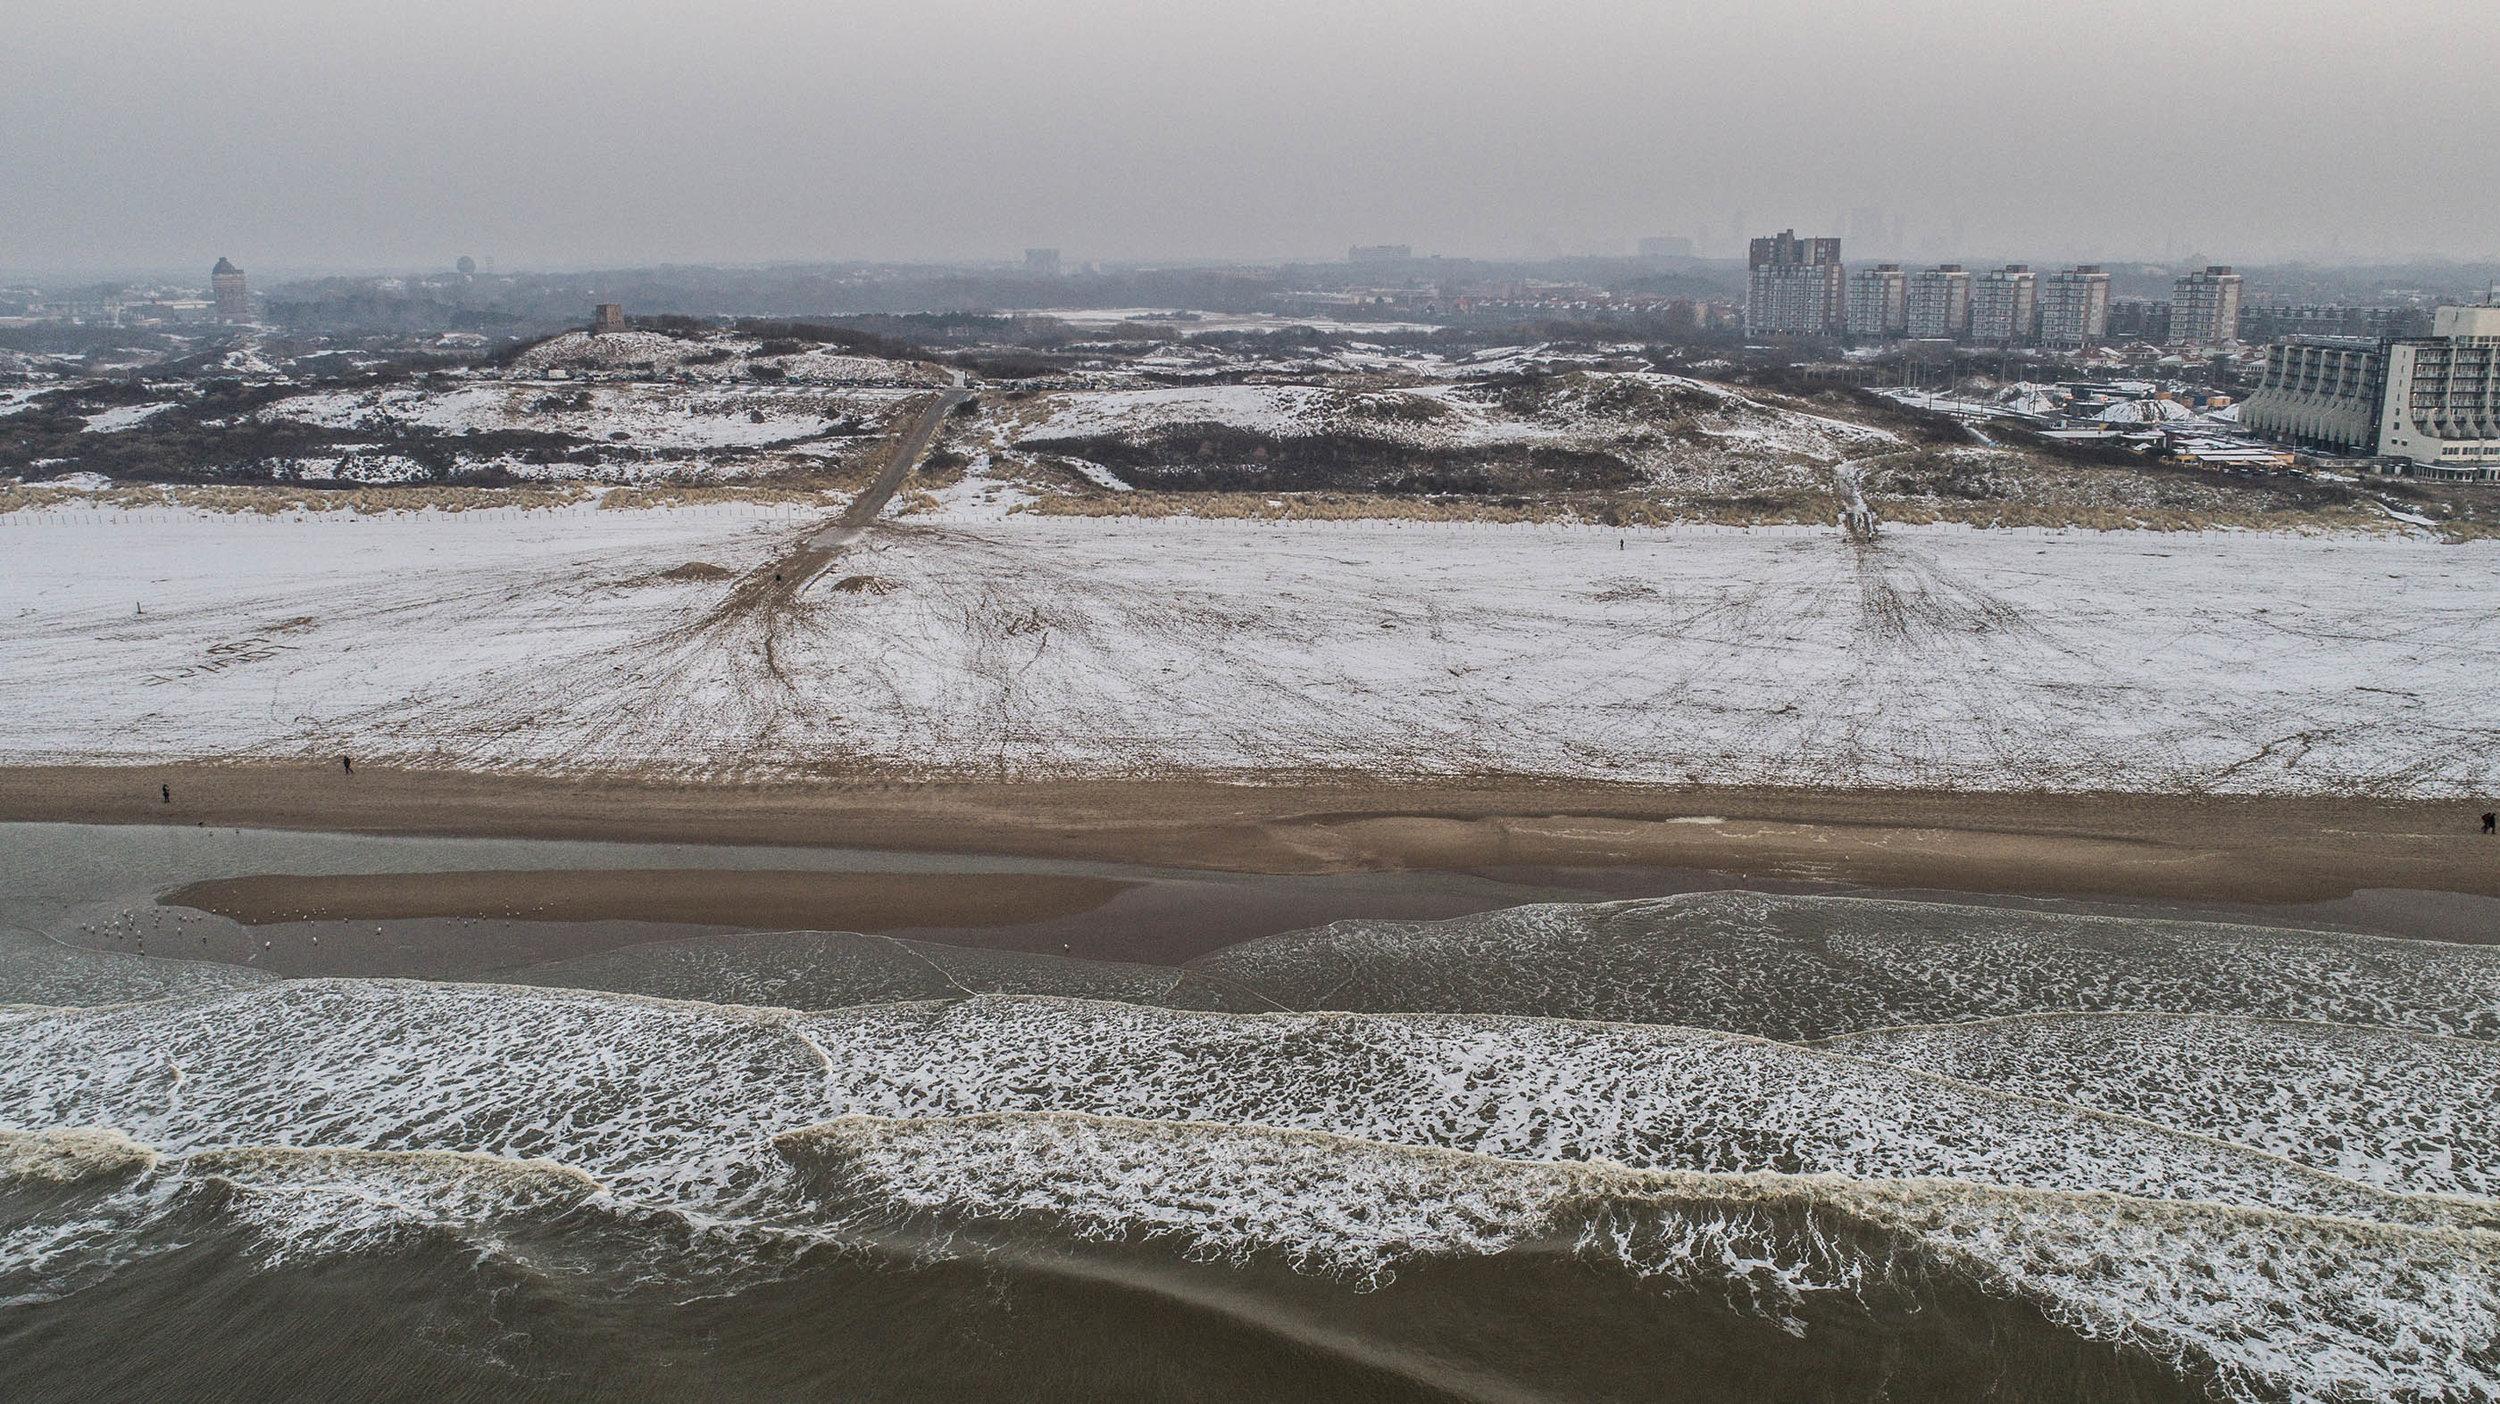 Scheveningen, the Netherlands   February 12, 2017